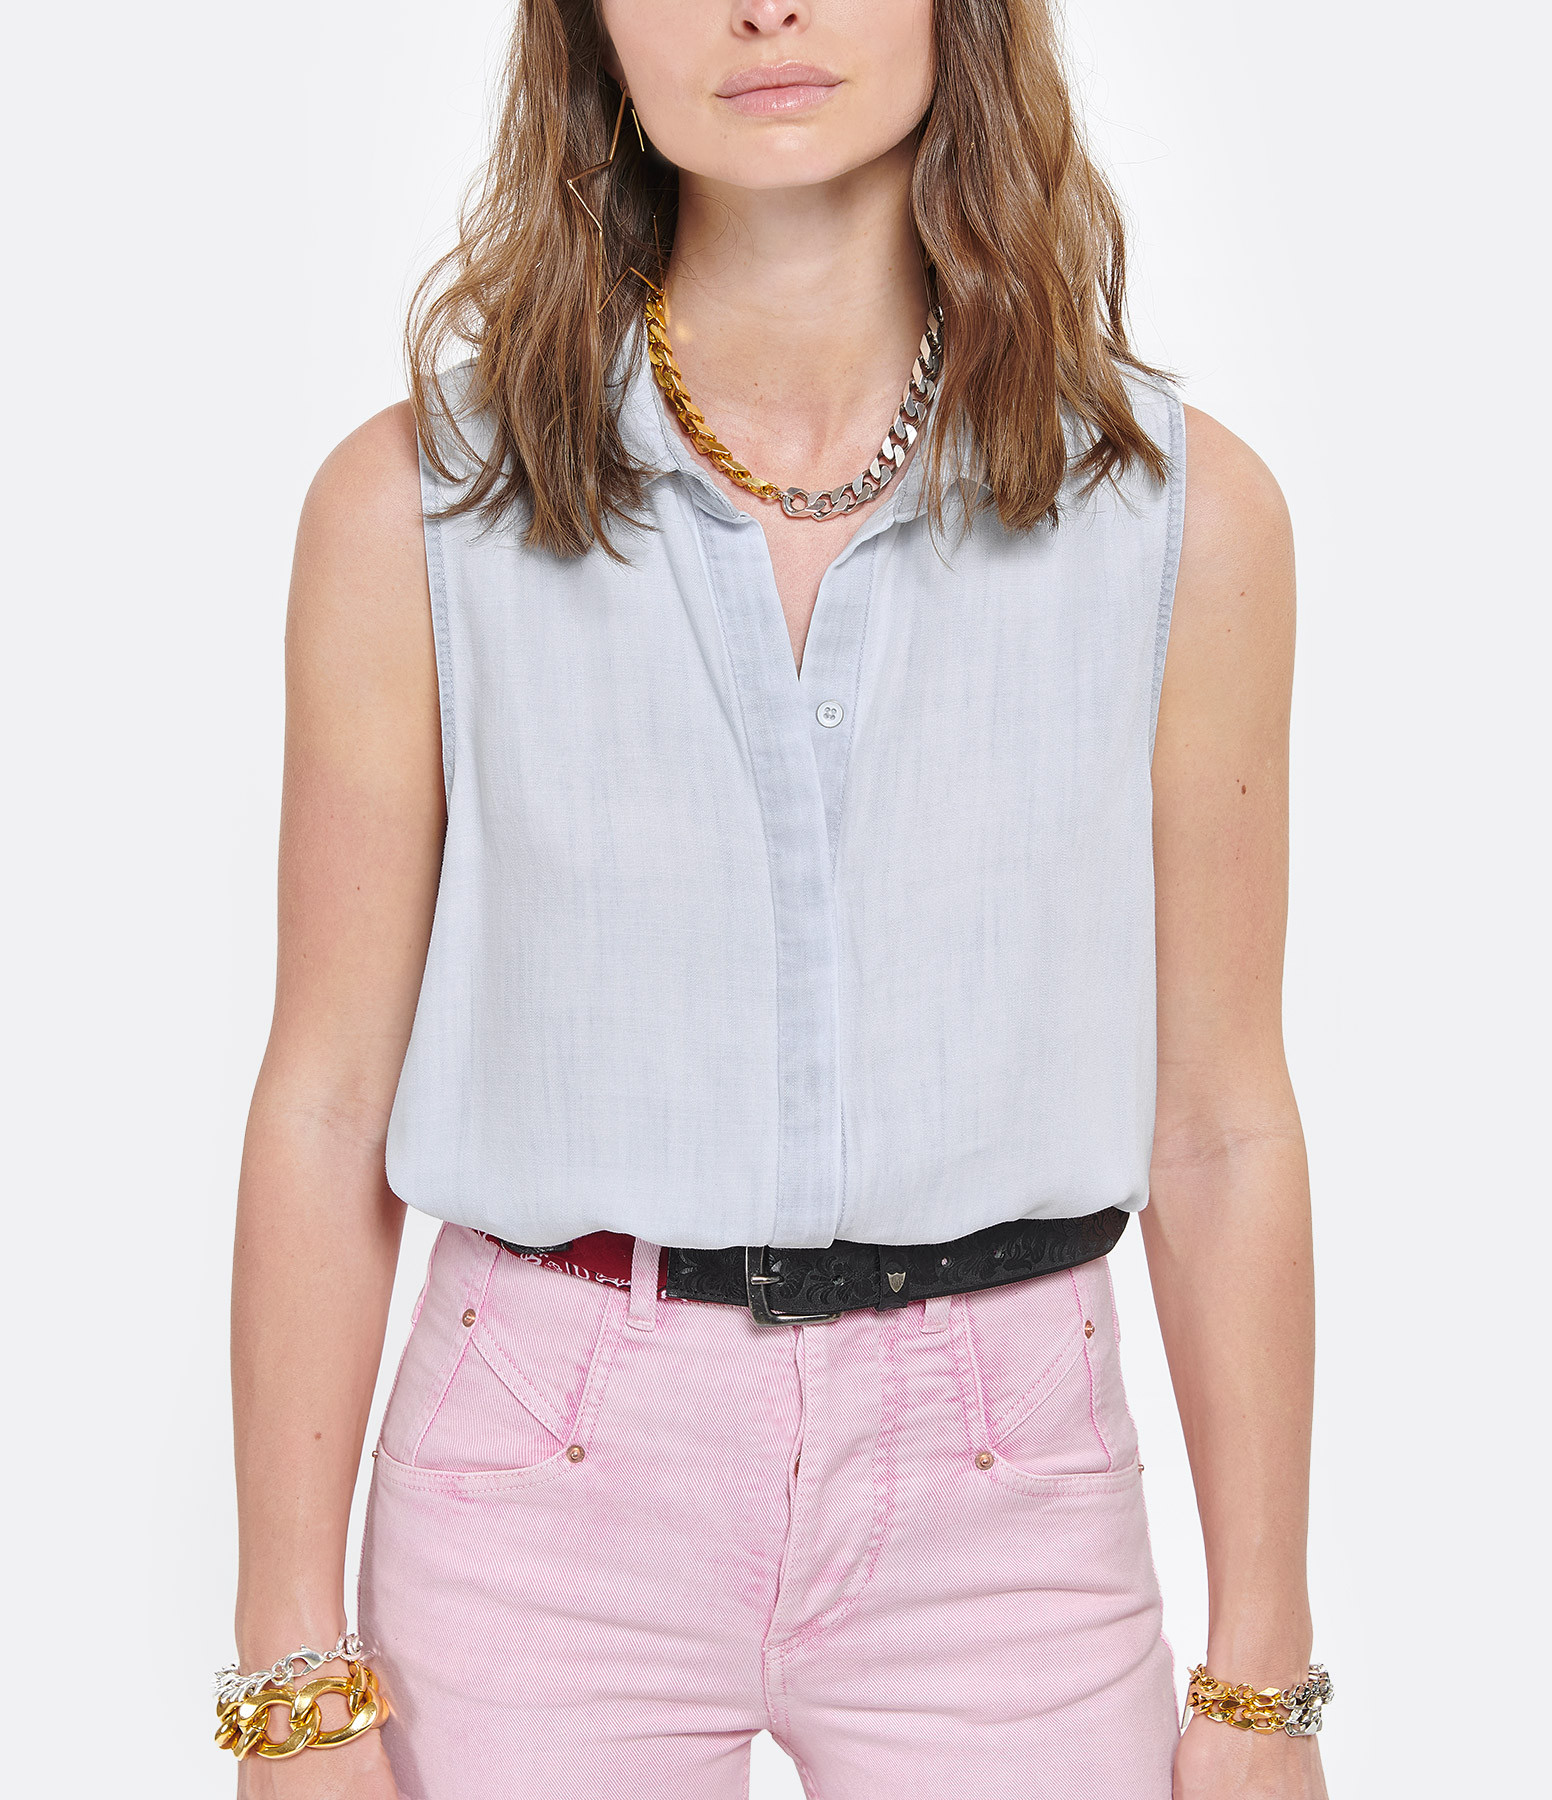 BELLA DAHL - Chemise Button Down Shirt Desert Sky Wash